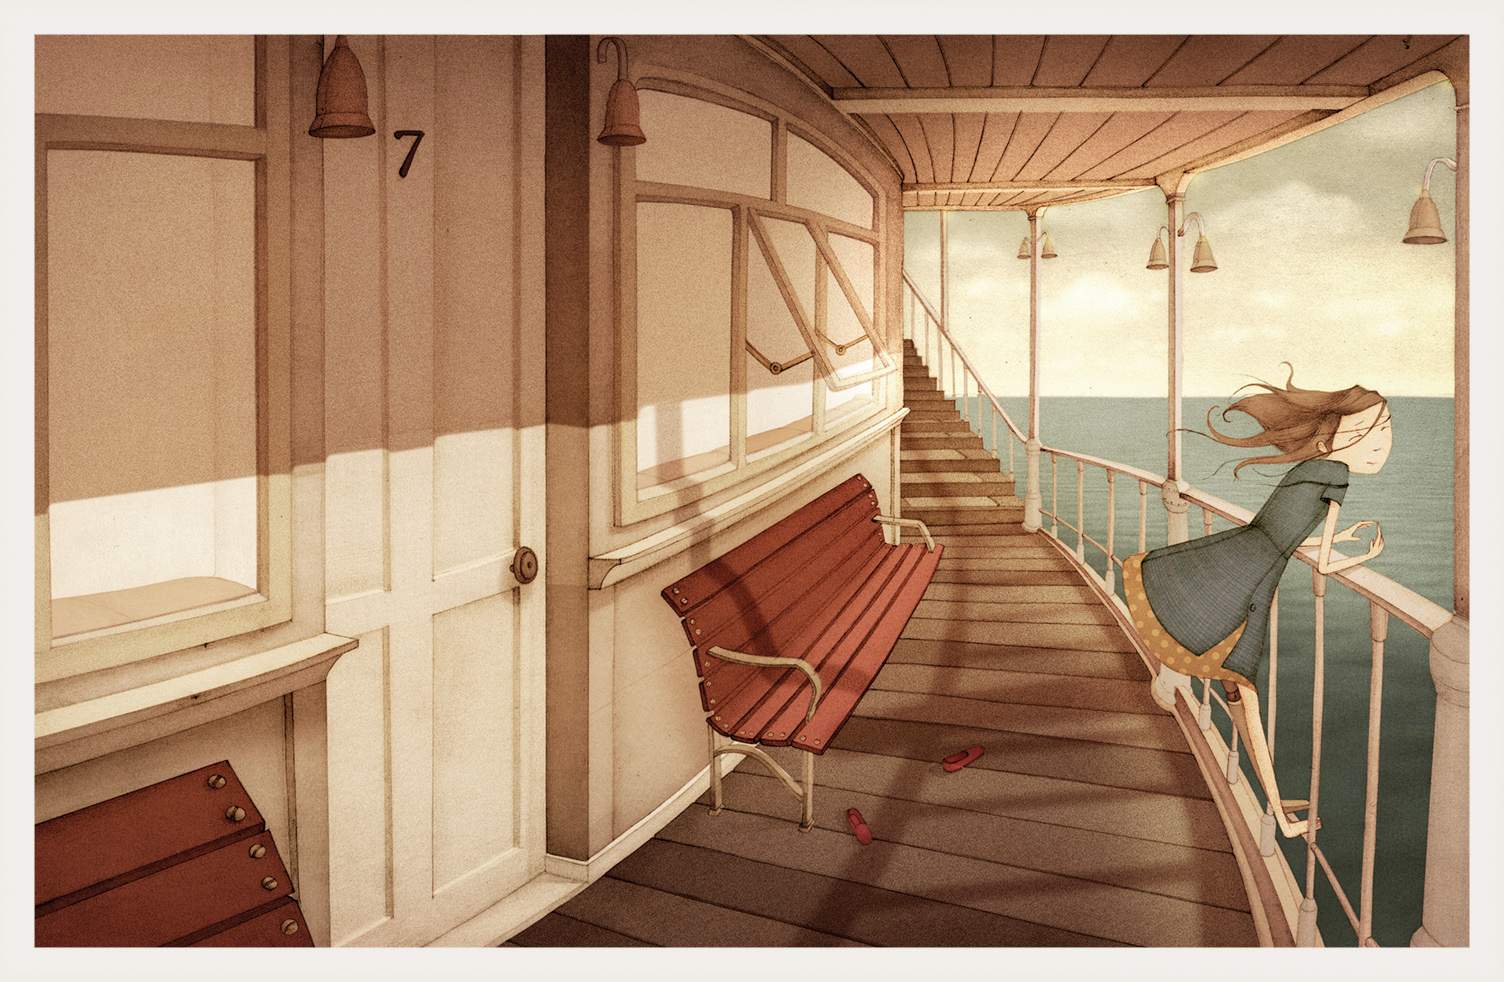 Nicholas Gannon / The Doldrums / Ocean Liner